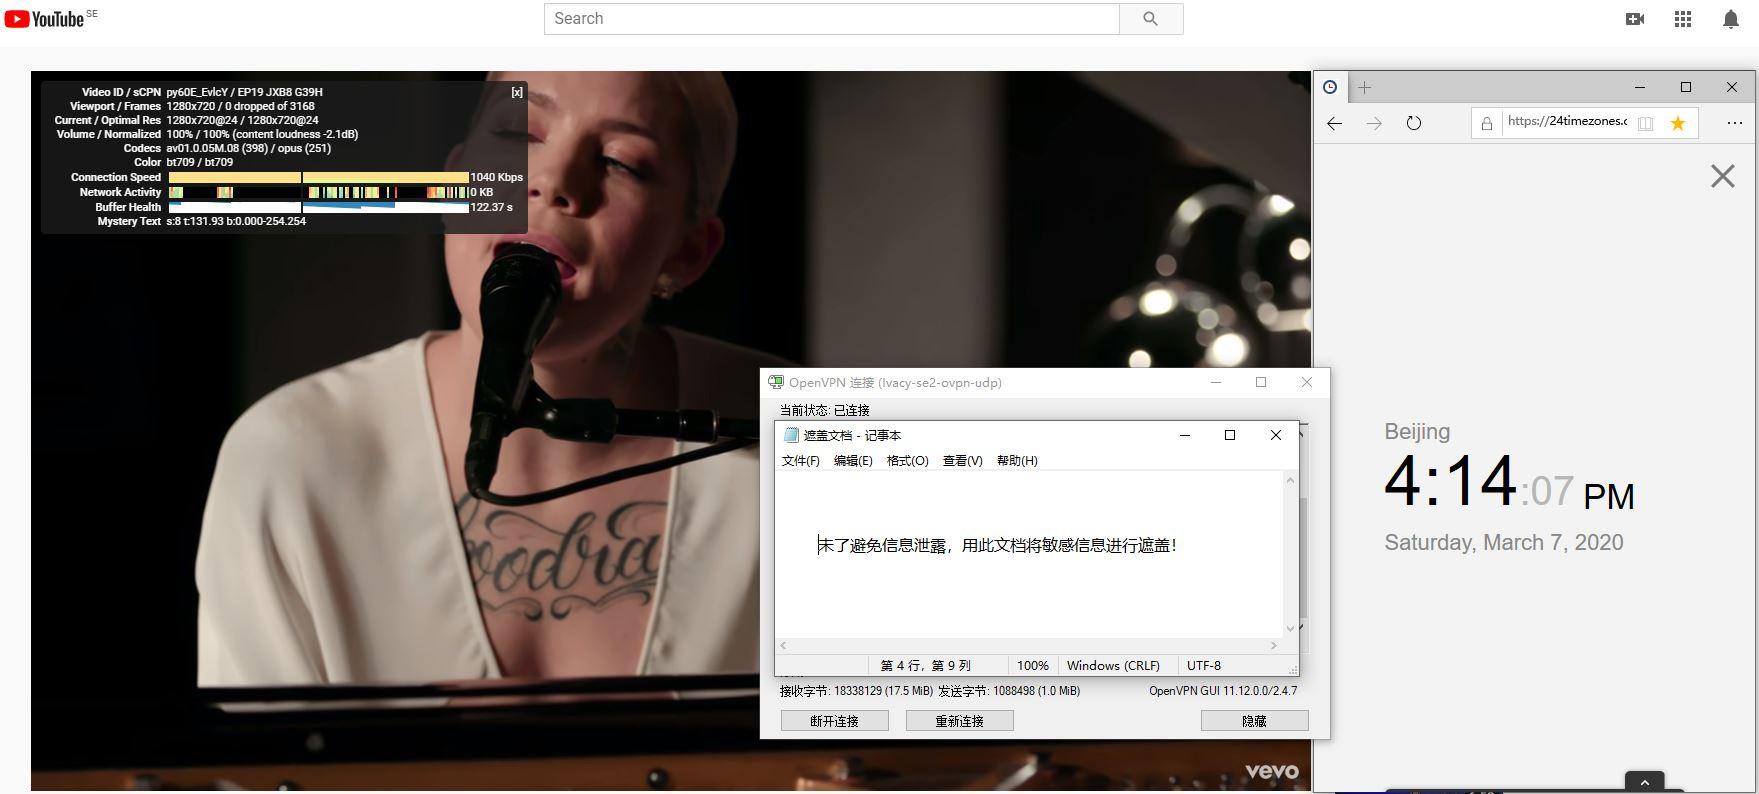 Windows10 IvacyVPN OpenVPN SE2 中国VPN翻墙 科学上网 Youtube测速 - 20200307